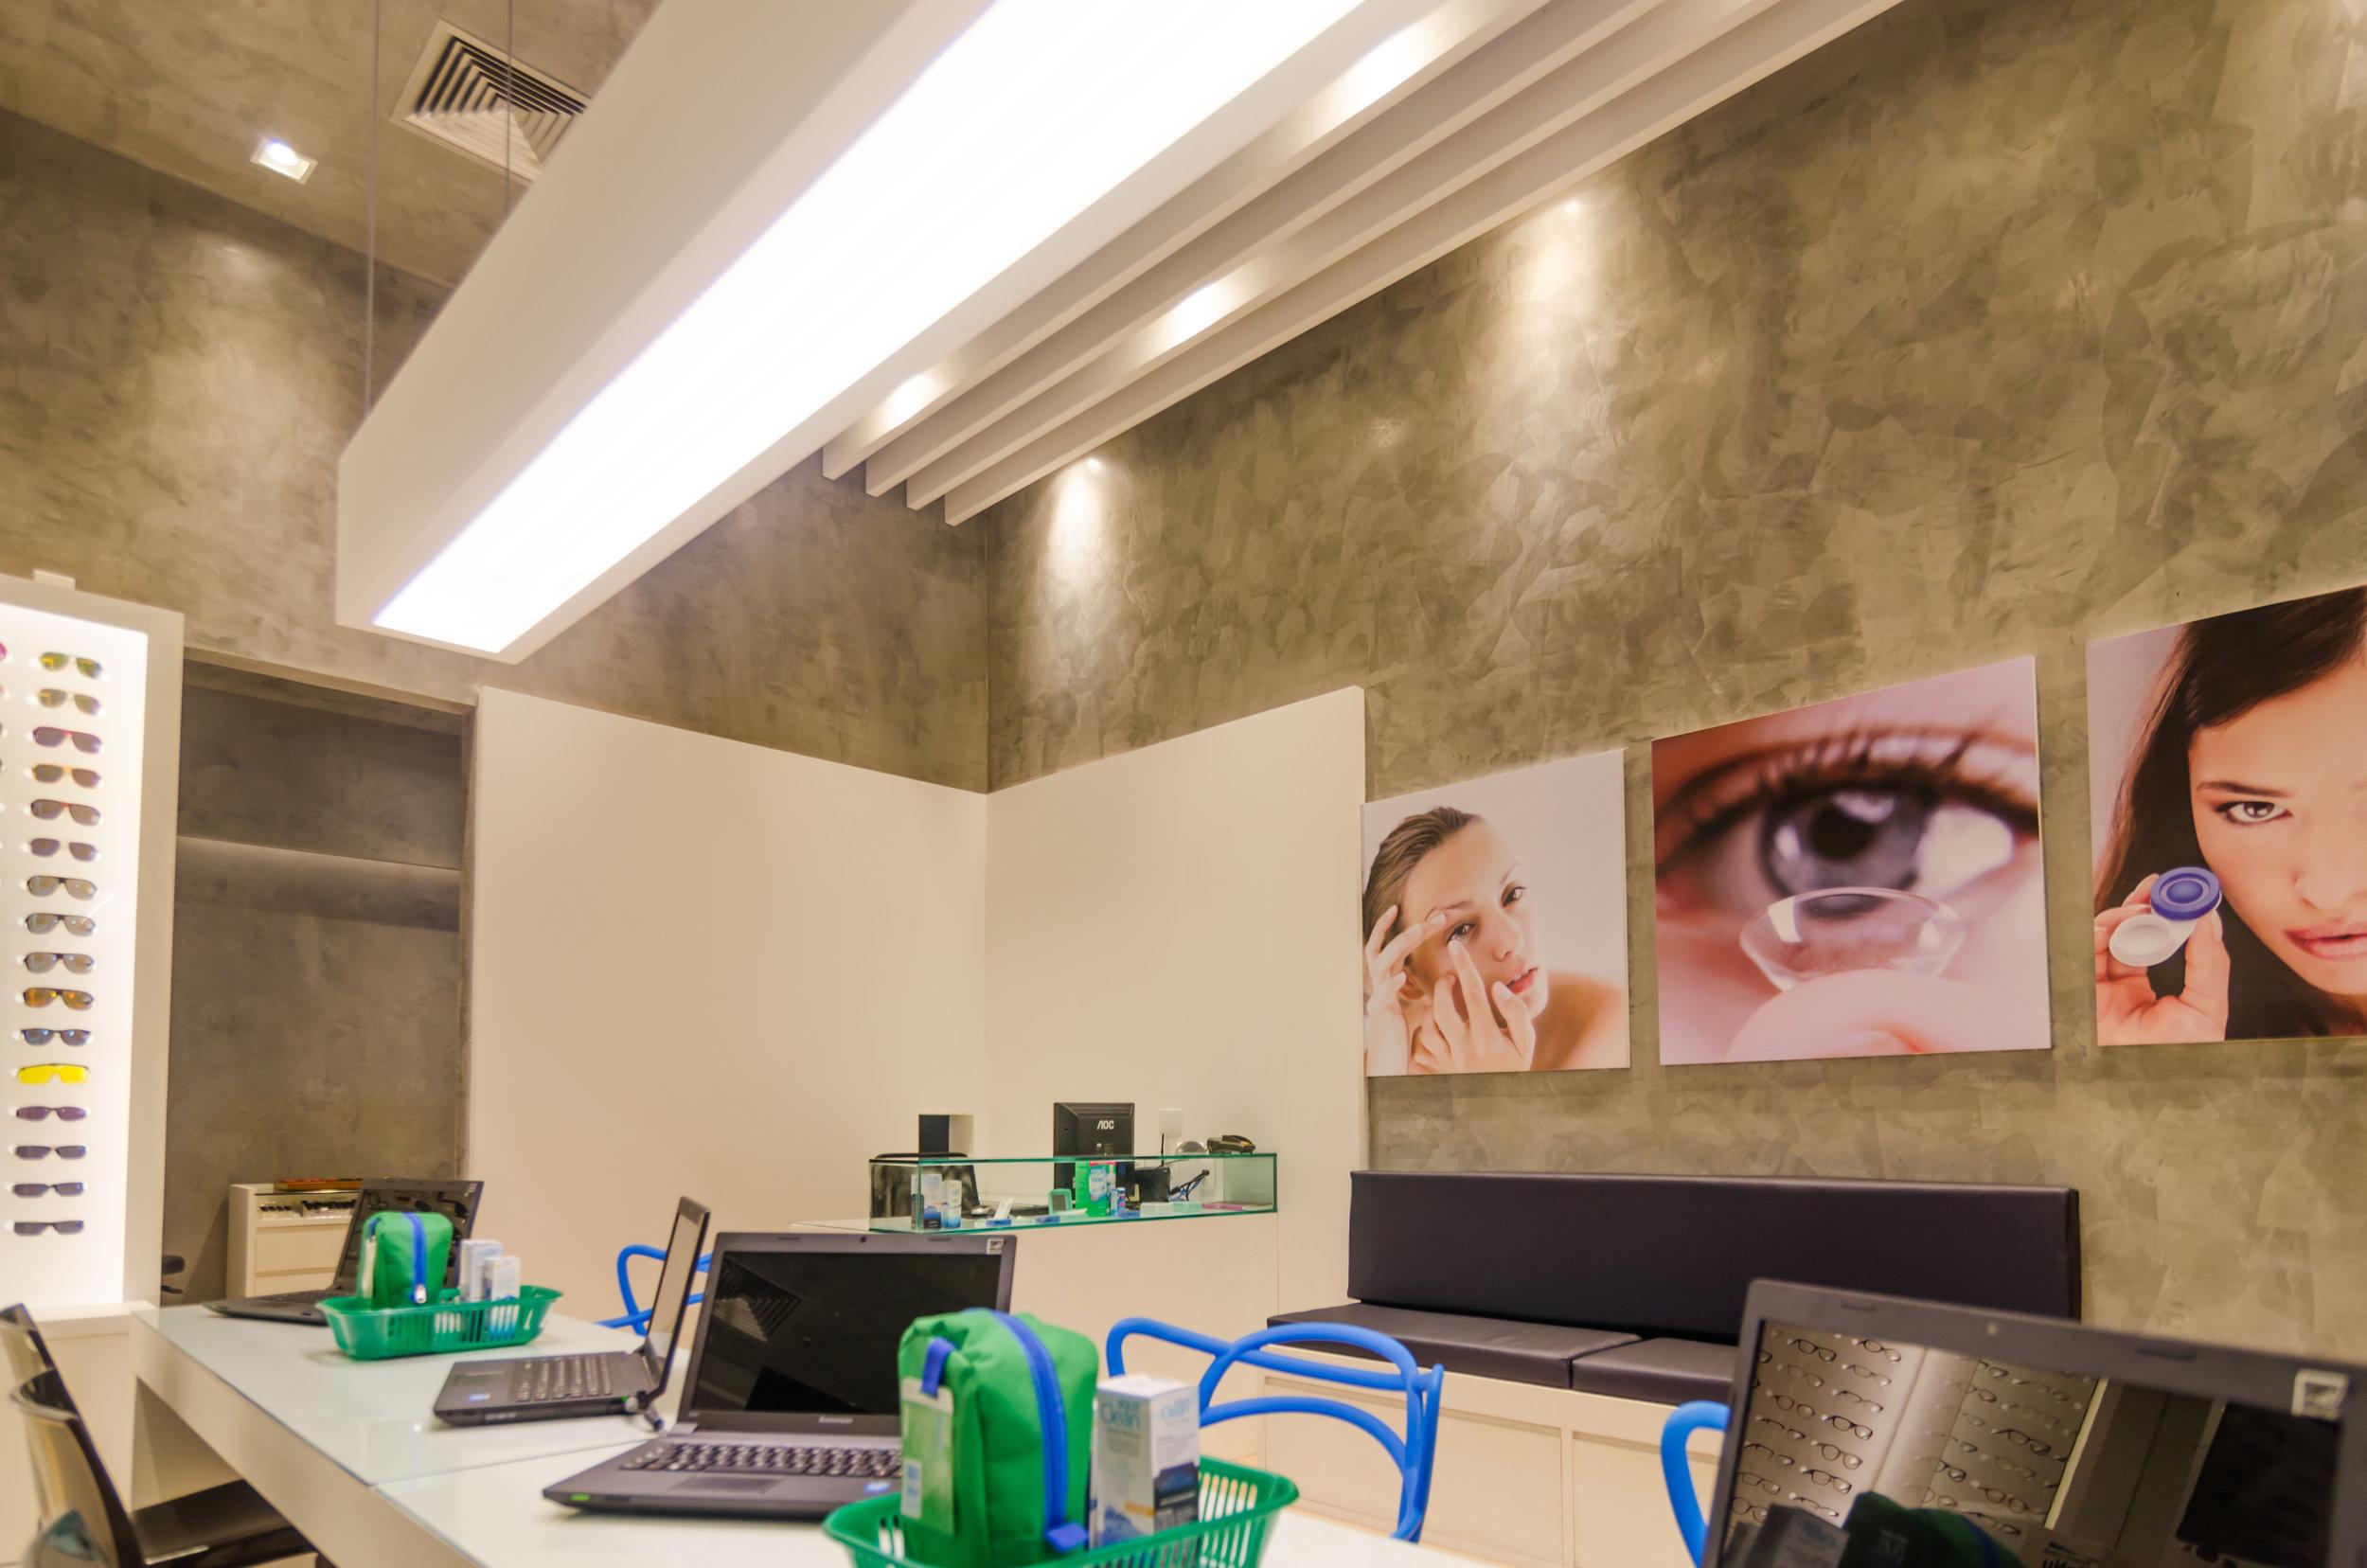 projeto-arquitetonico-newvision-duo-arquitetura-01projeto-arquitetonico-newvision-duo-arquitetura-0.jpg